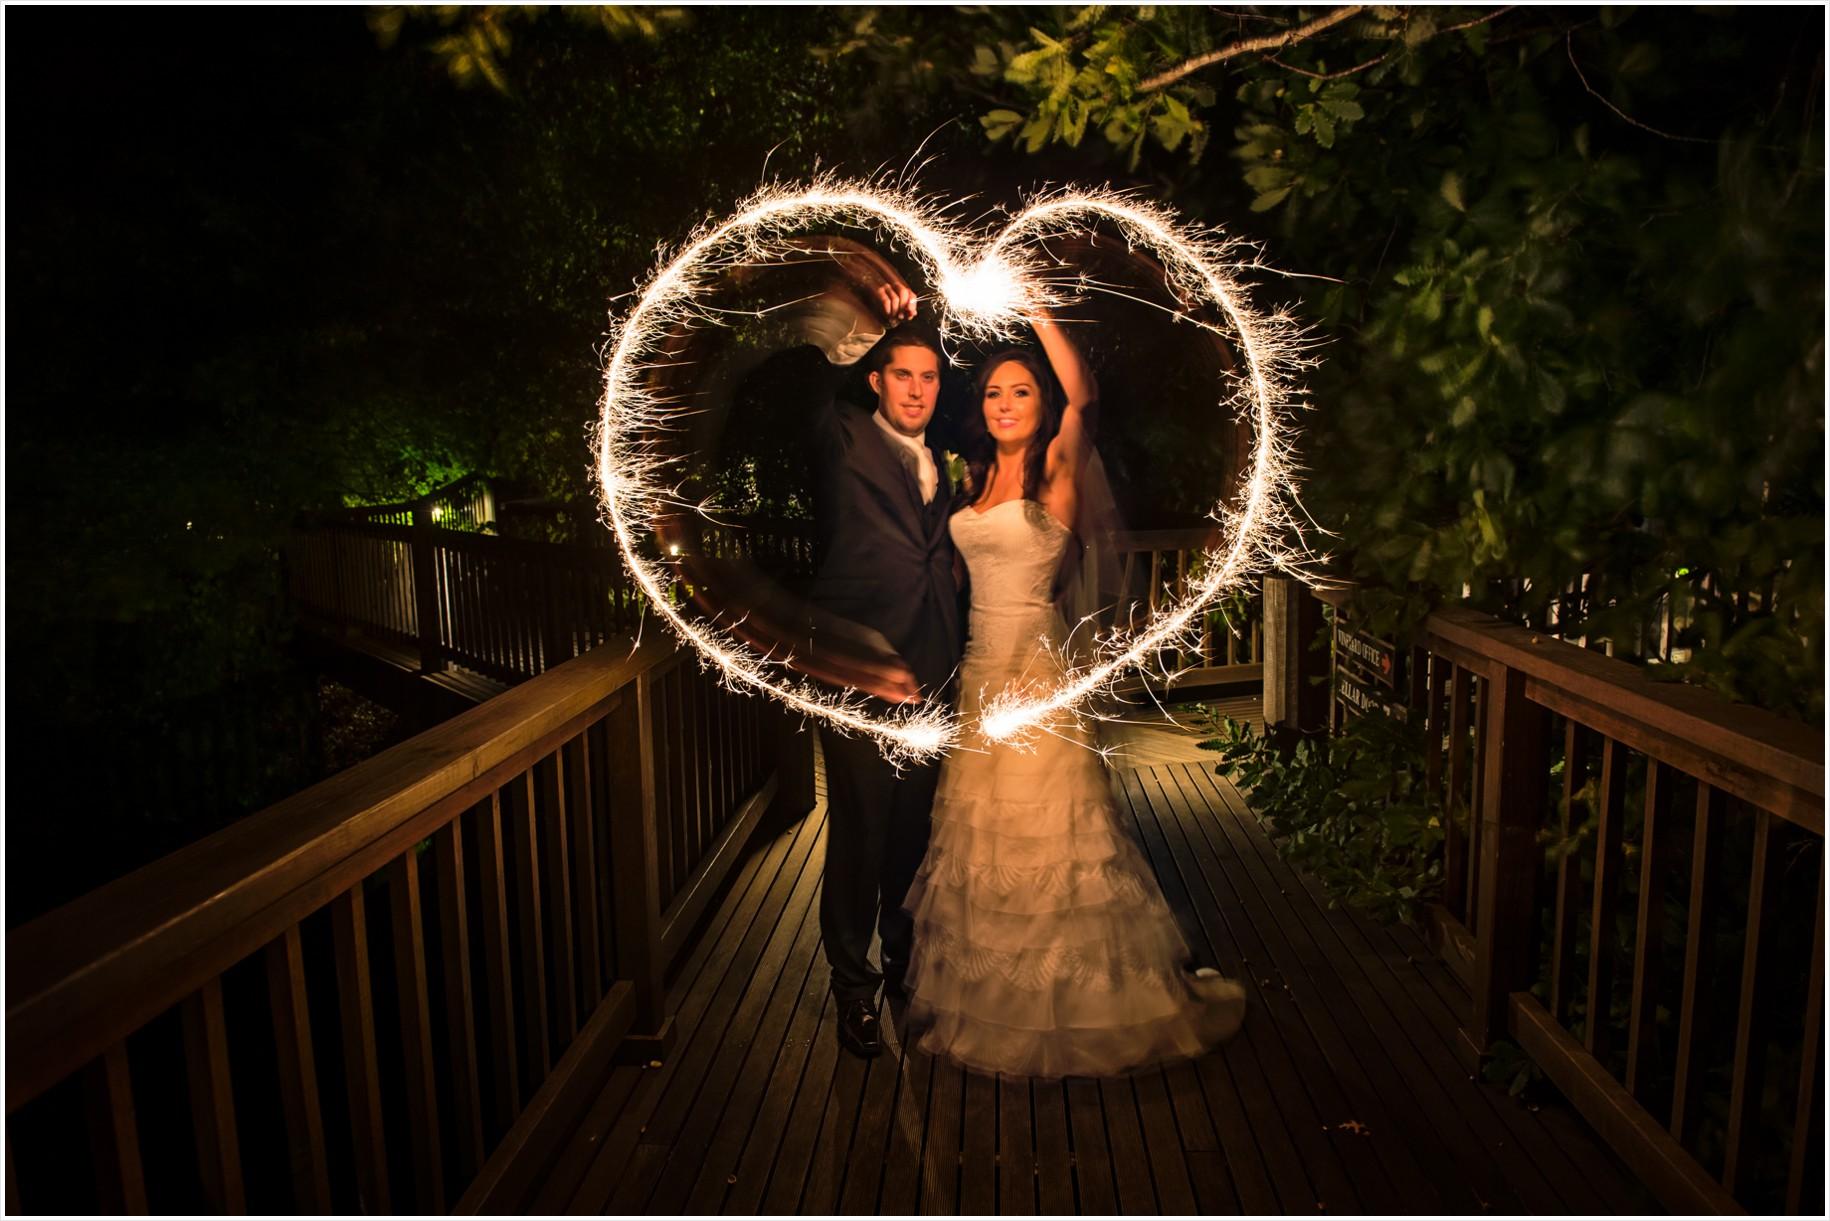 Best Wedding Photographers.How Do I Know If I Have Chosen The Best Wedding Photographer Crm